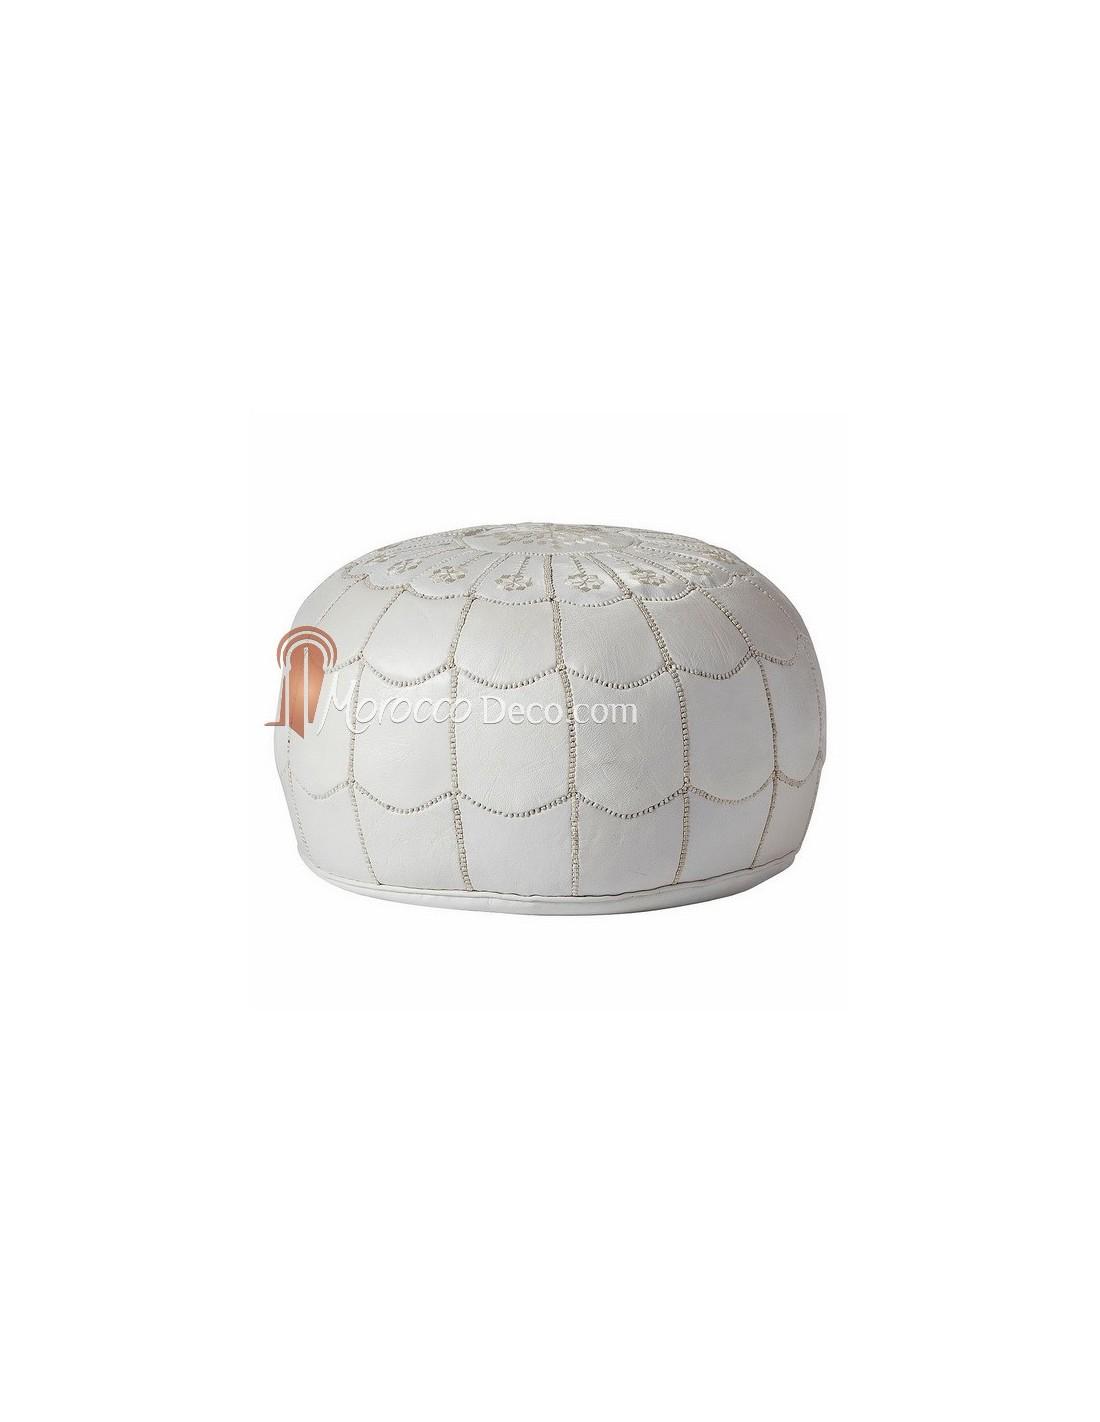 pouf marocain design arcade en cuir blanc fabriqu et cousu la main. Black Bedroom Furniture Sets. Home Design Ideas